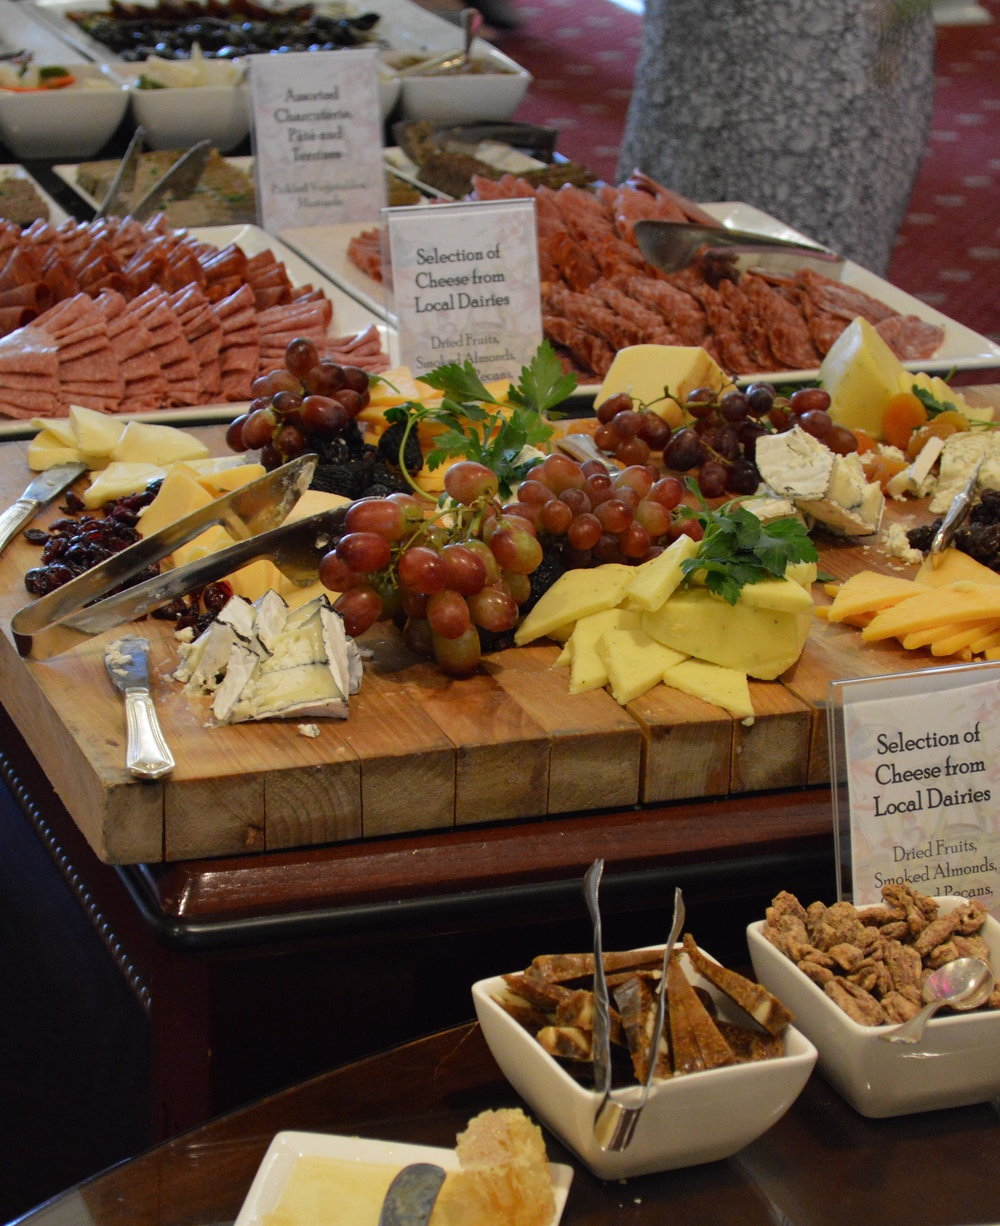 LaurenSchwaiger-Blog-The-Ballantyne-Hotel-Brunch-Cheese-Selection.jpg